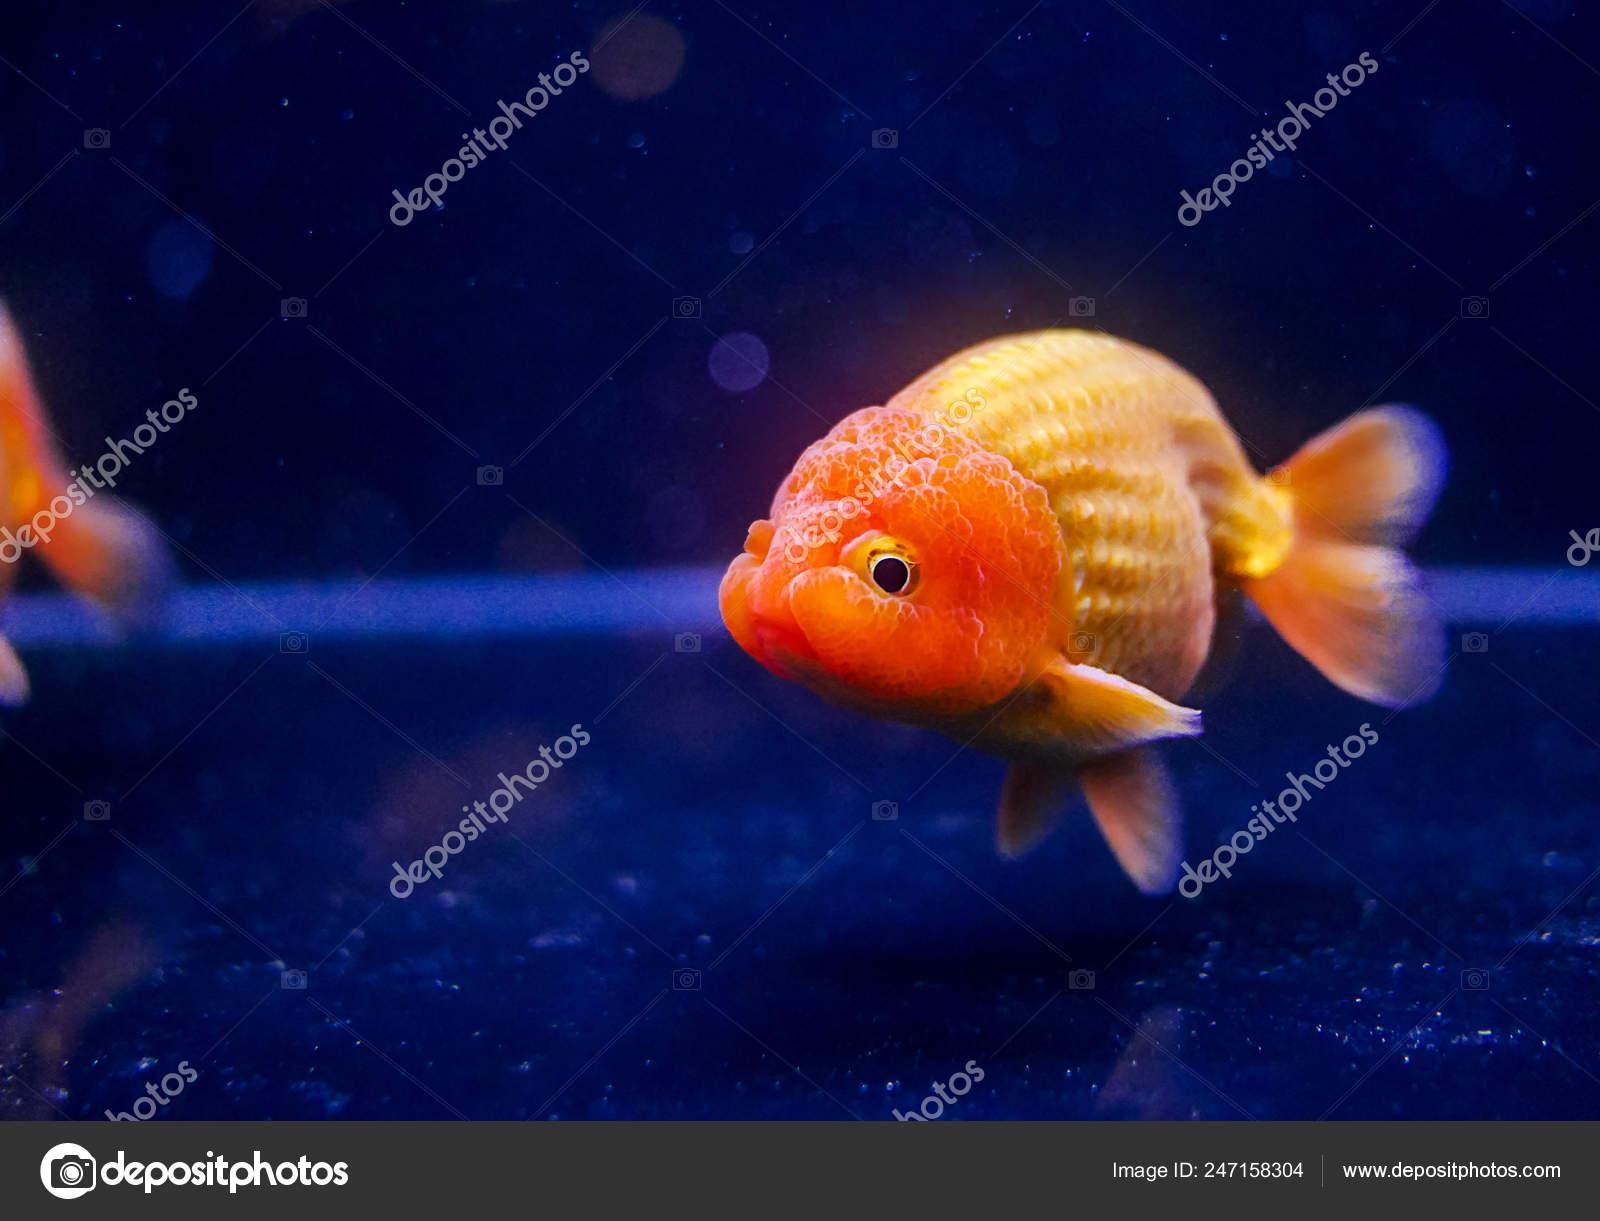 Lion Head Oranda Goldfish Aquarium — Stock Photo © khoamartin #247158304